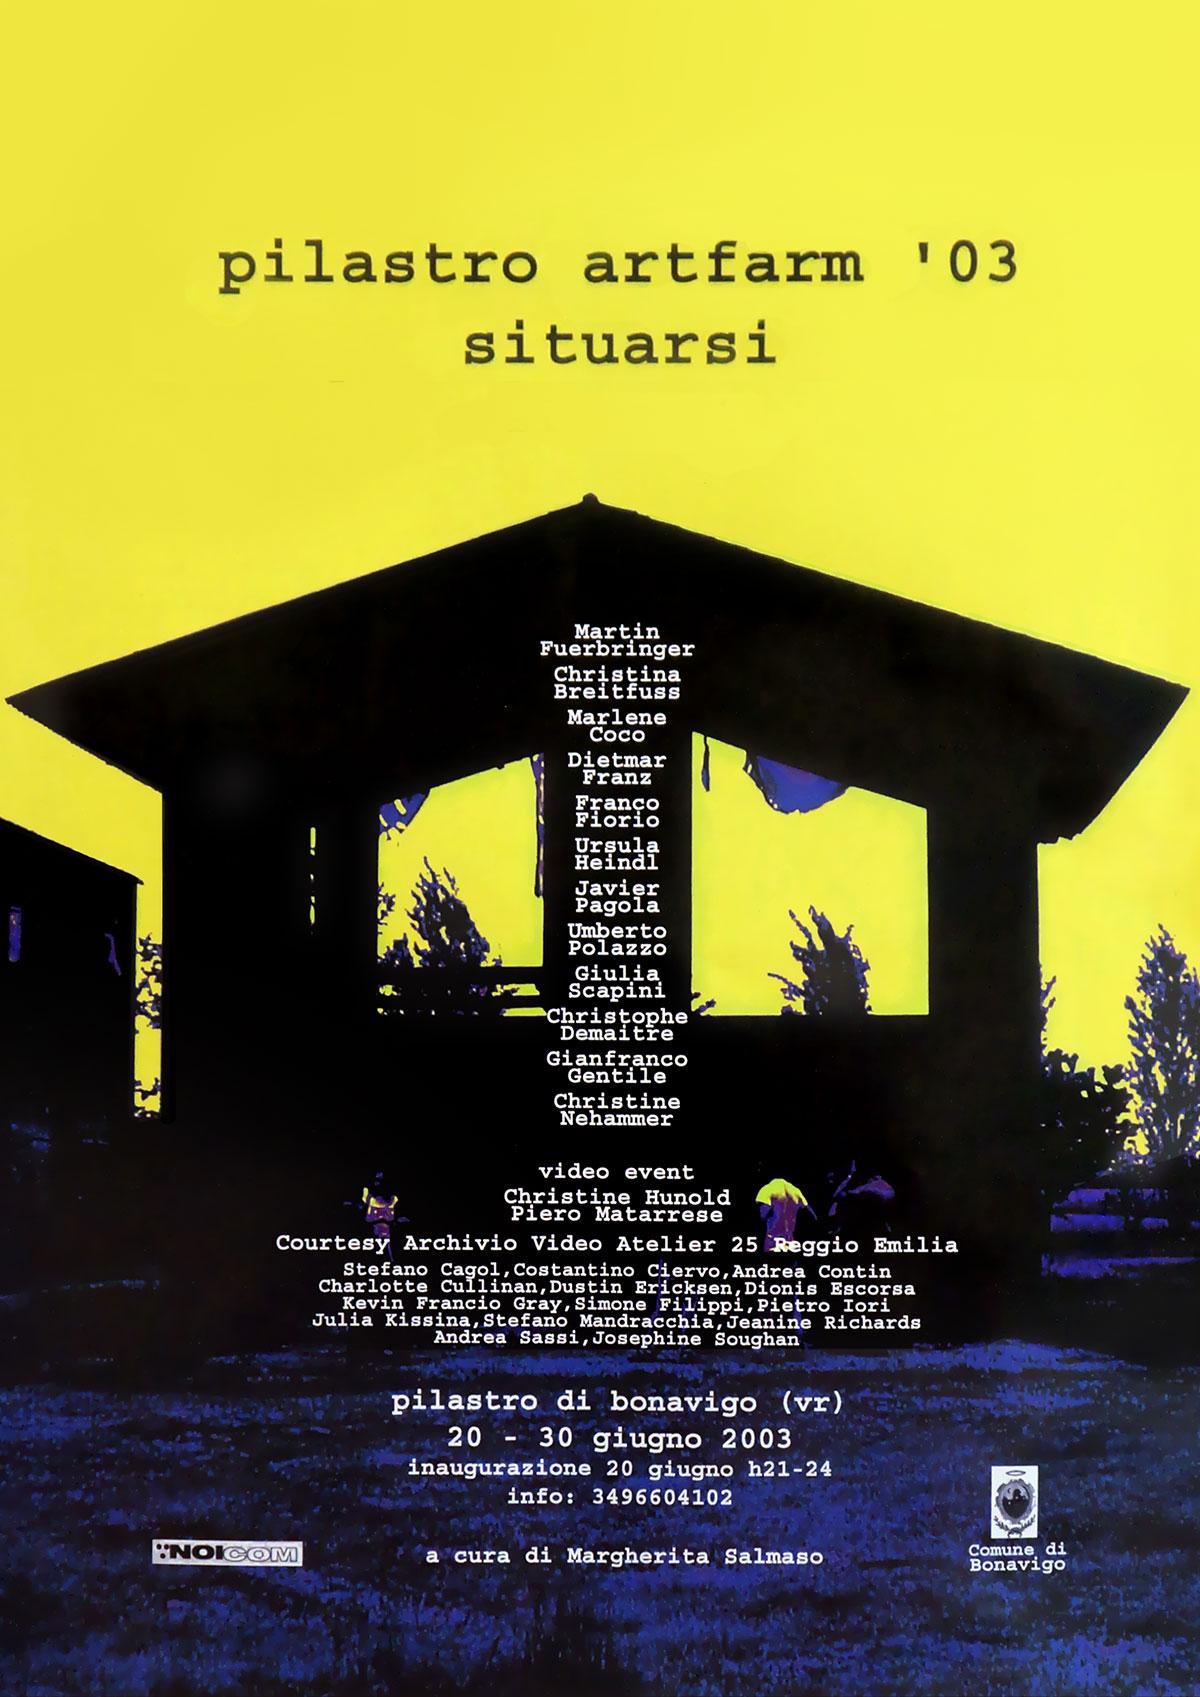 Situarsi - Artfarm Pilastro -2003